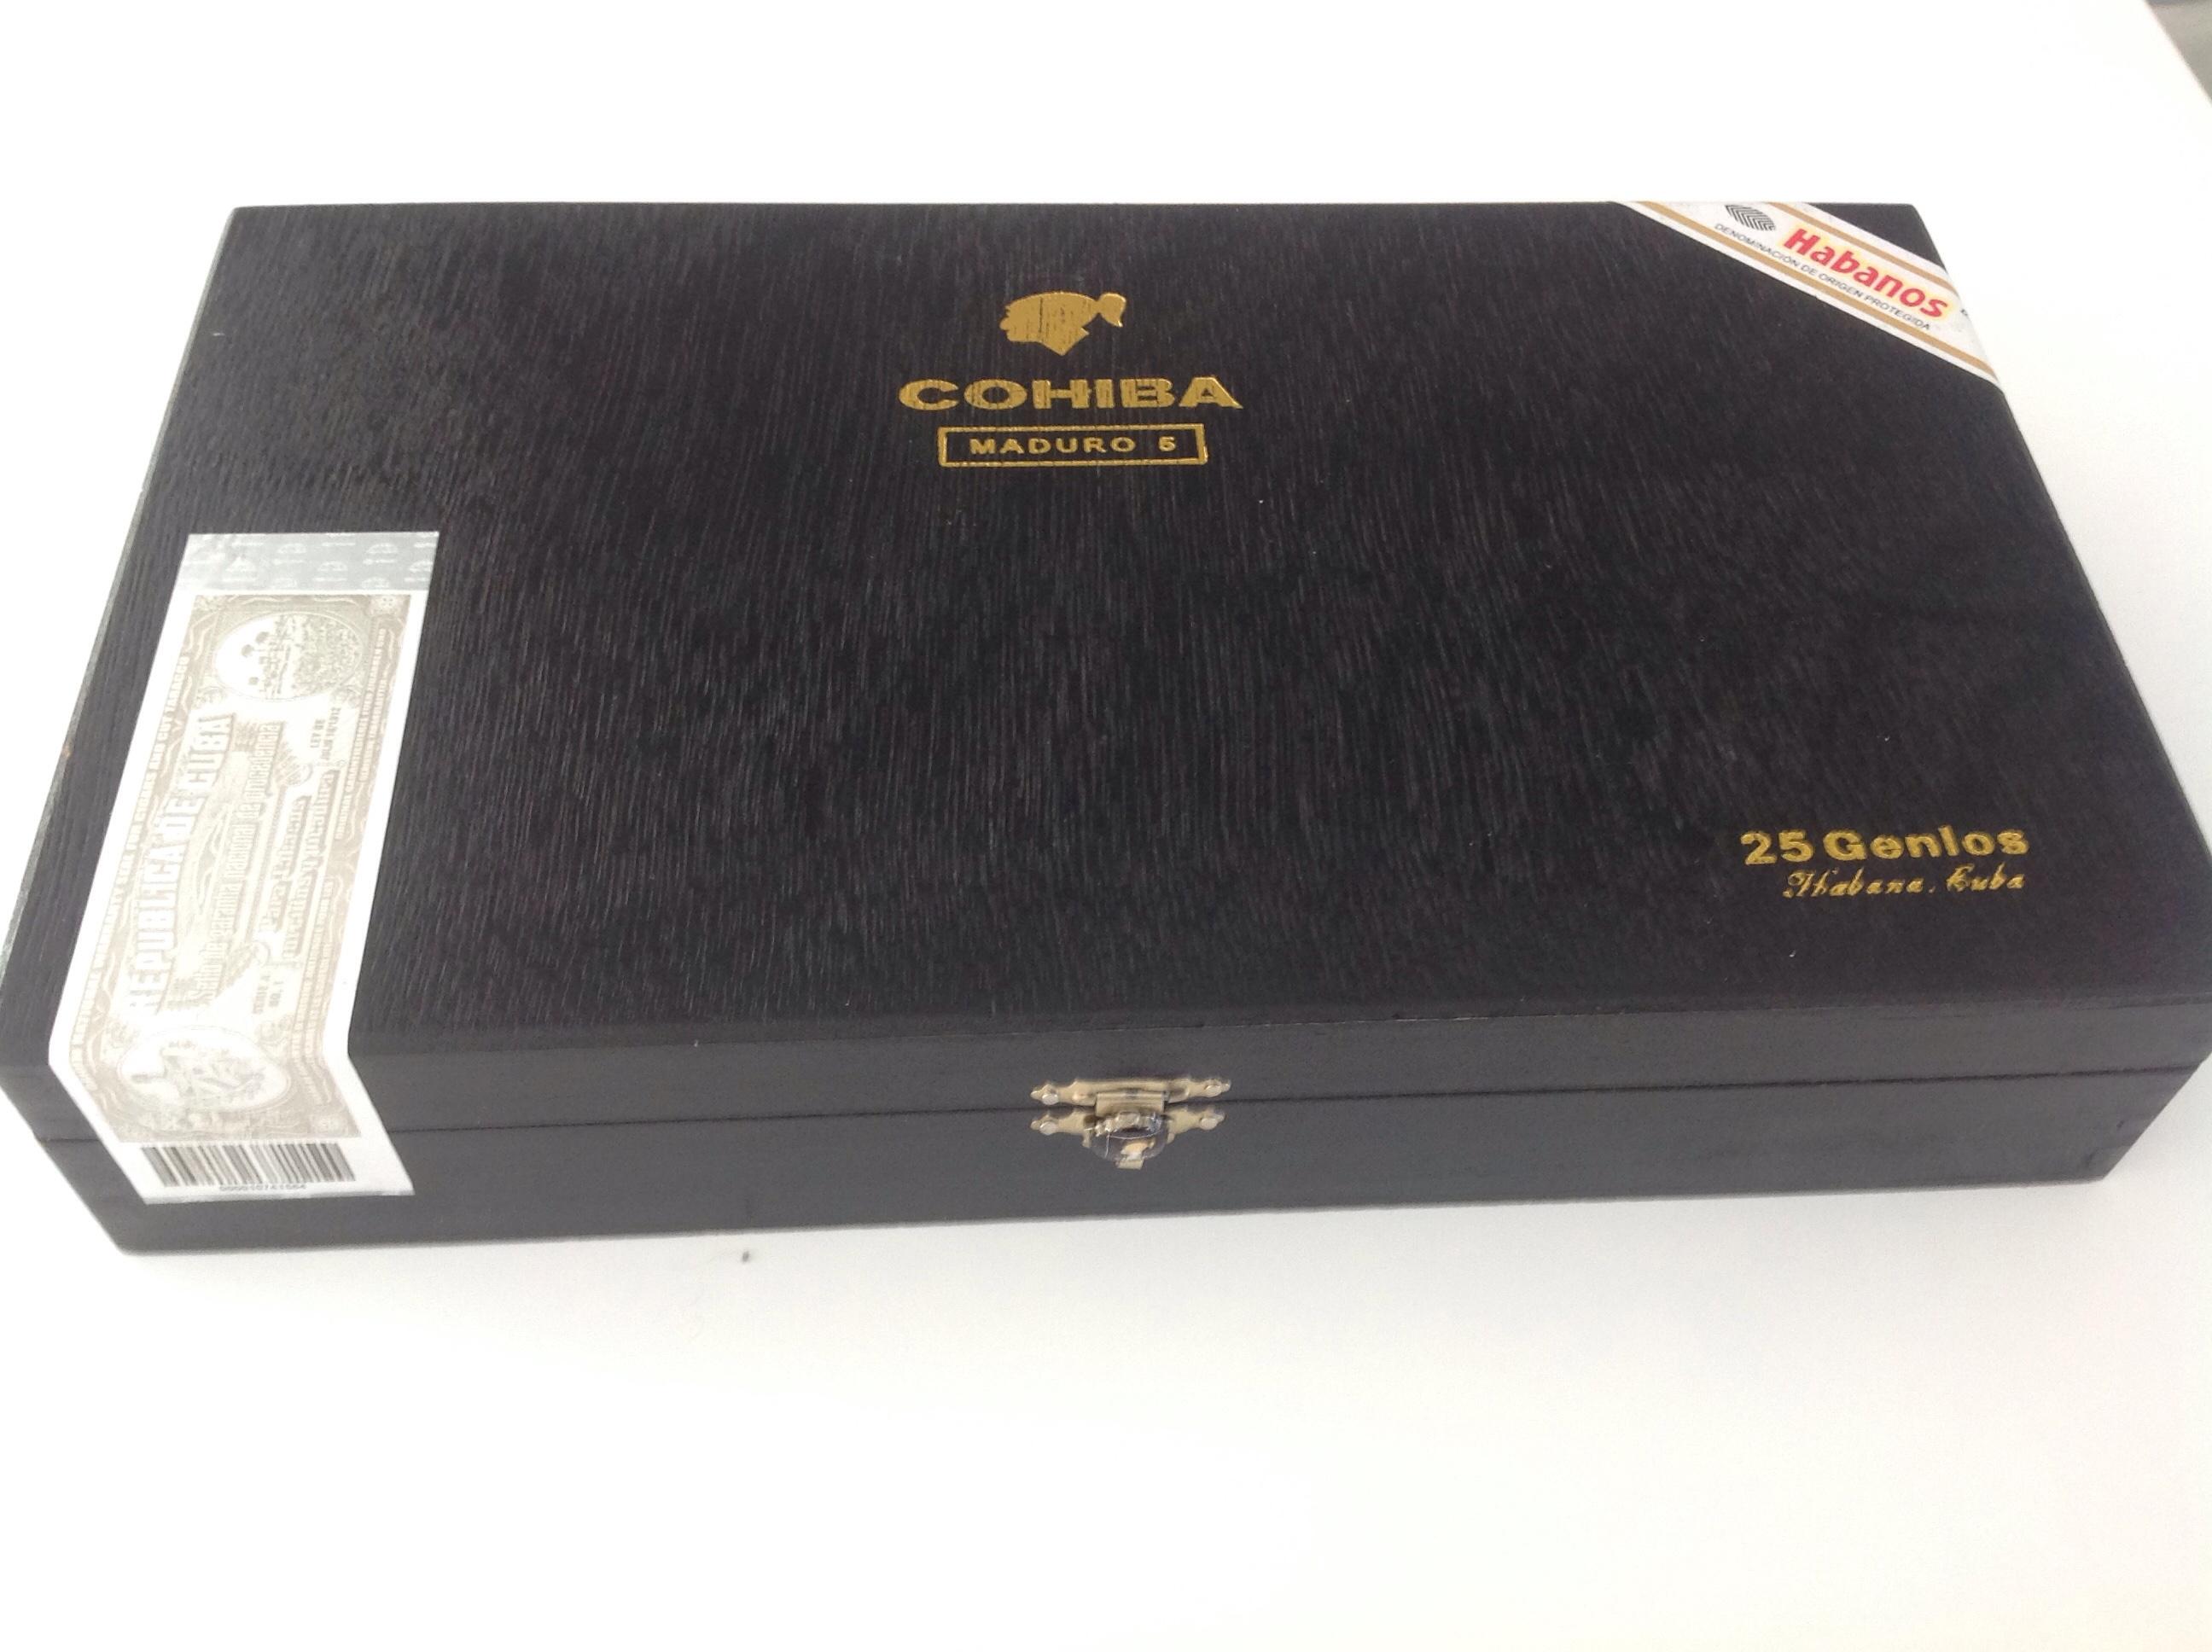 Coffret noir de 25 cigares COHIBA GENIOS série MADURO 5  . 350 Perpignan (66)